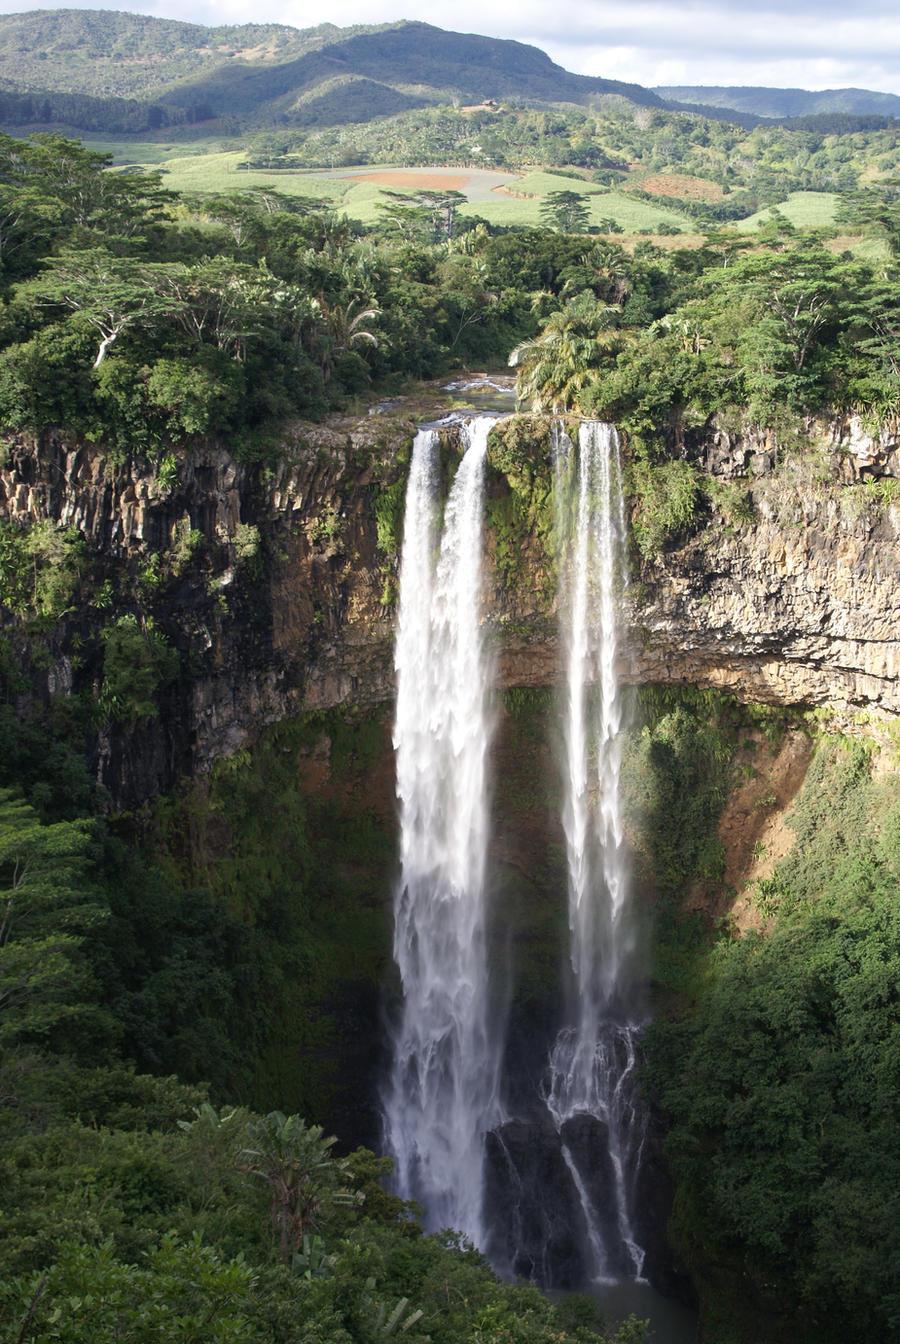 Waterfall by Heike09